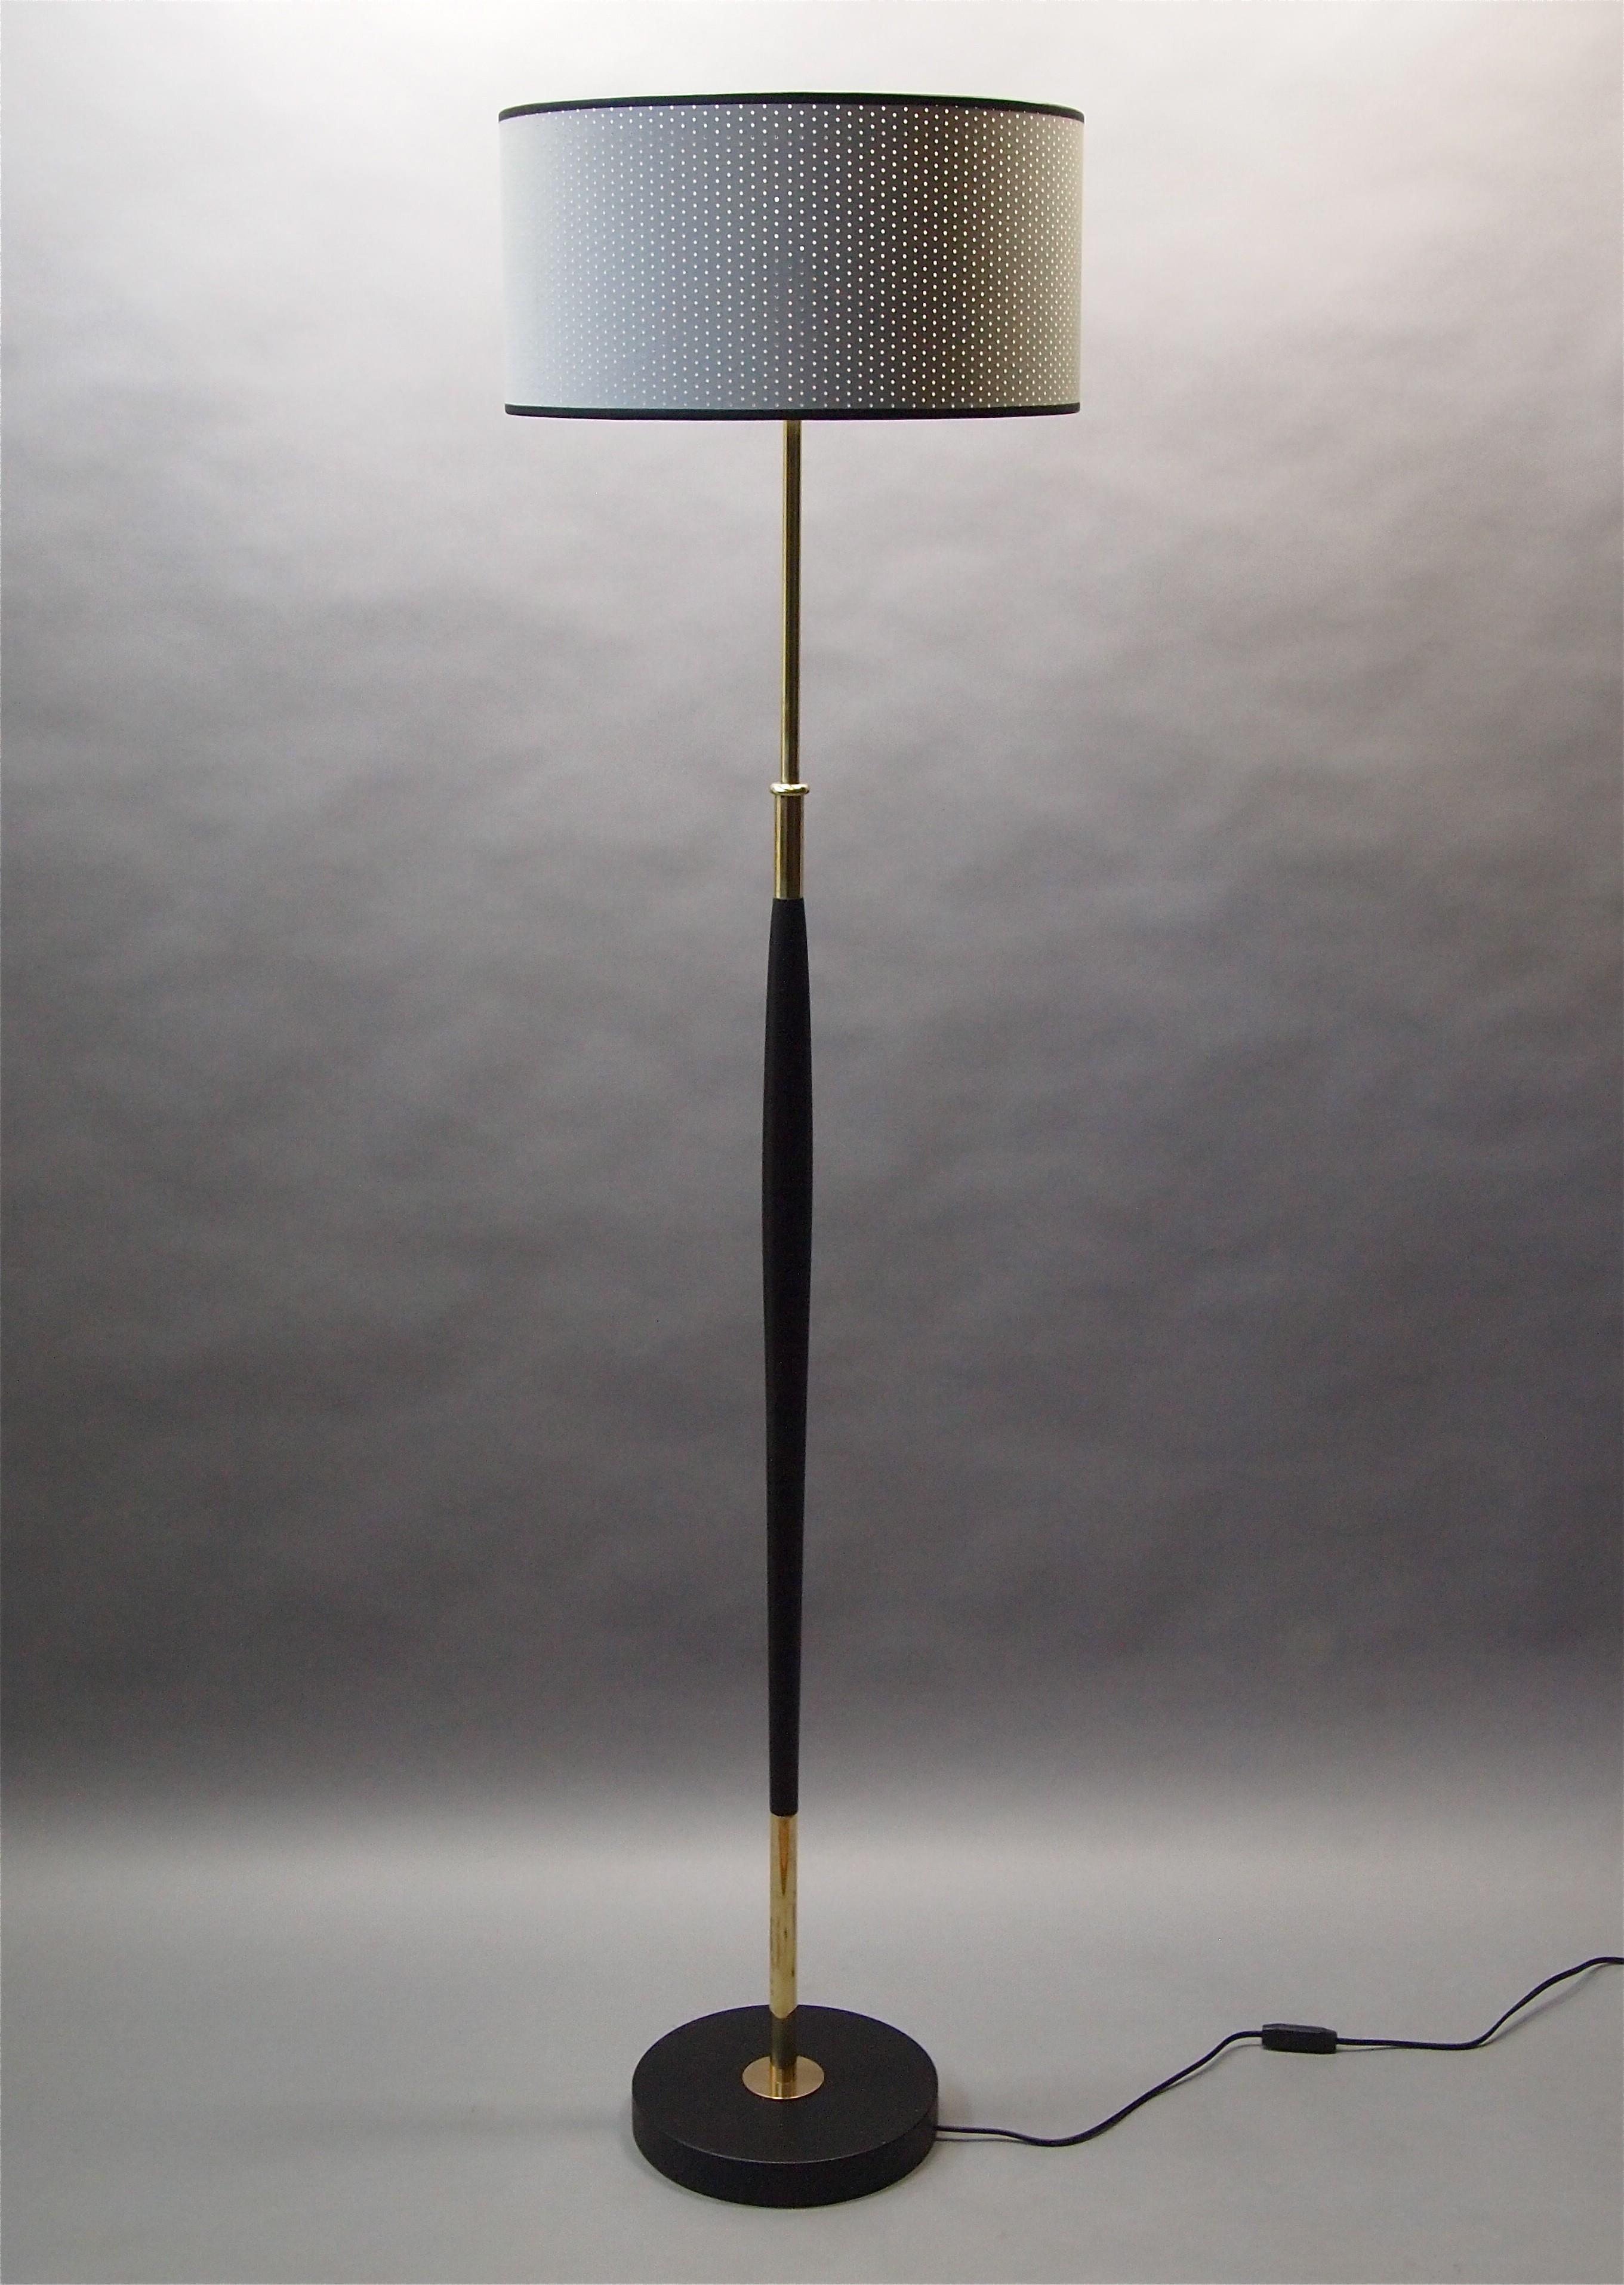 Mid Century Floor Lamp By Maison Lunel 1950s